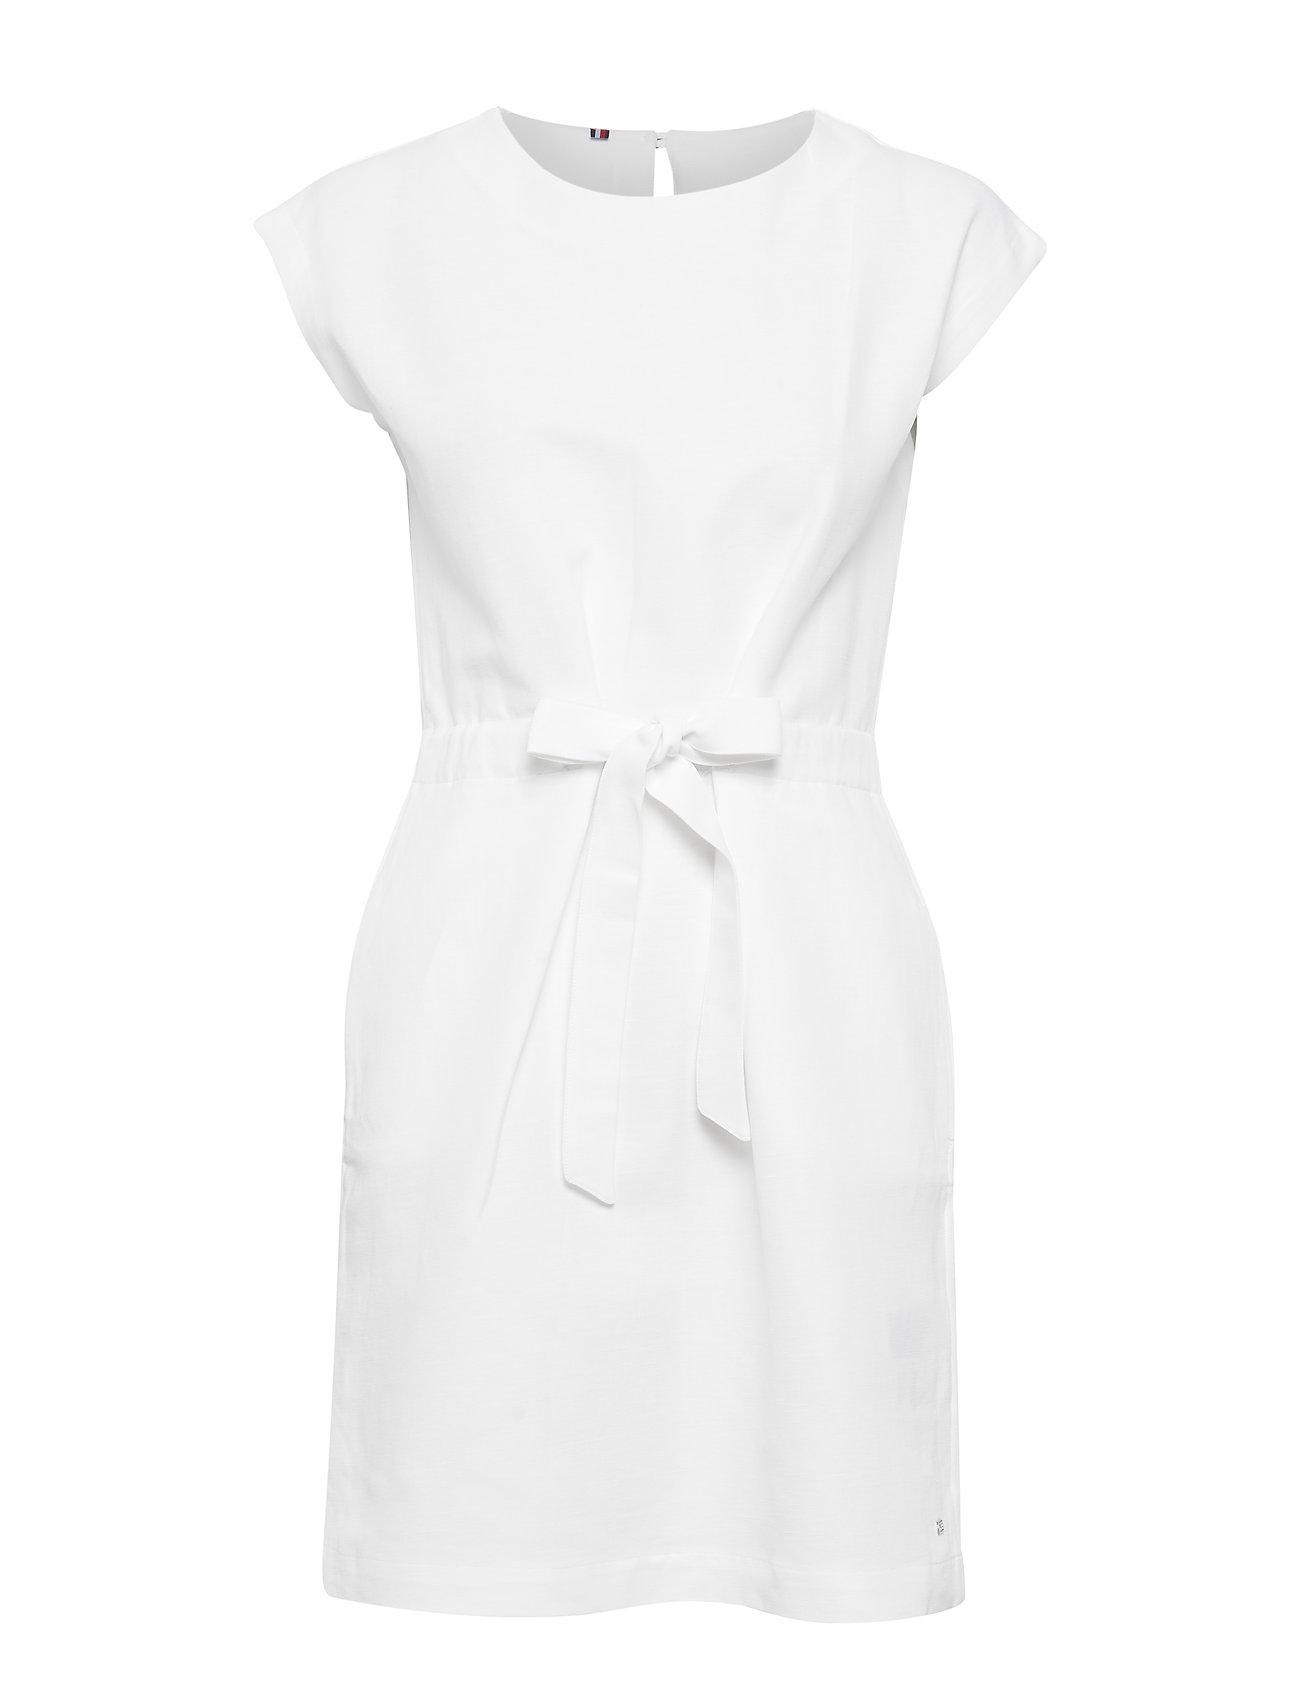 Tommy Hilfiger CAROLINA DRESS - CLASSIC WHITE